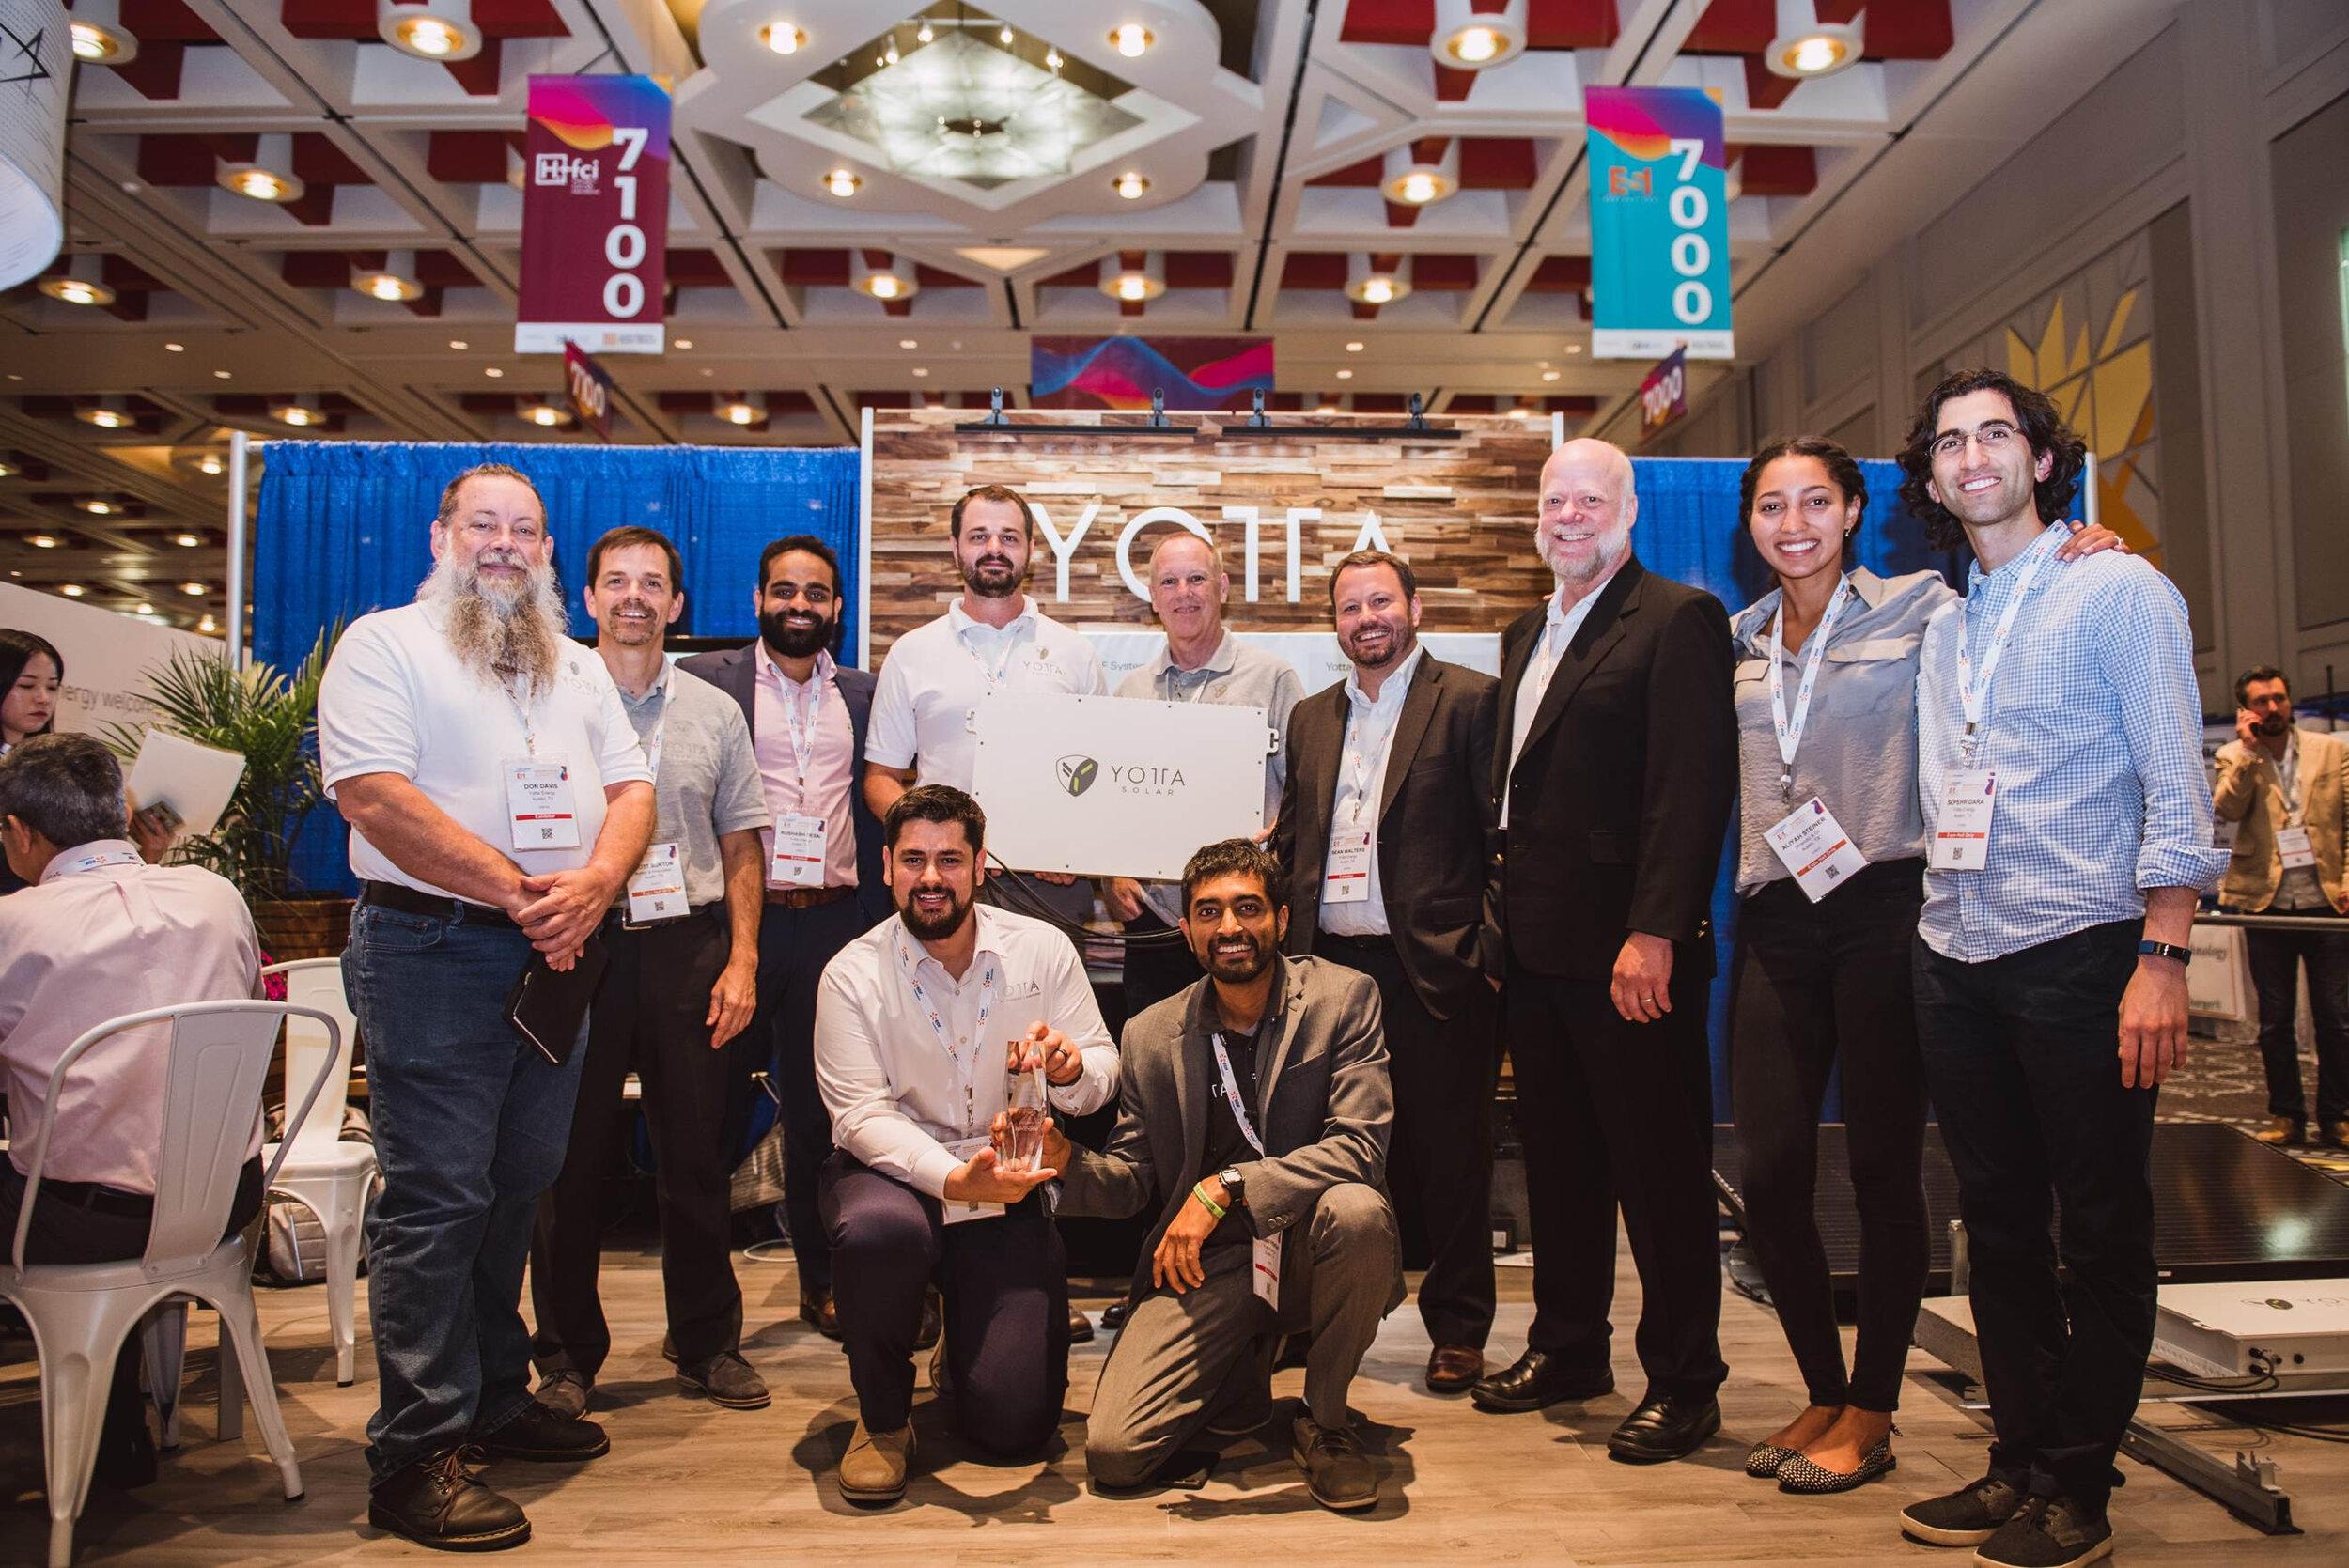 Yotta Named Solar Power International 2019 Startup of the Year